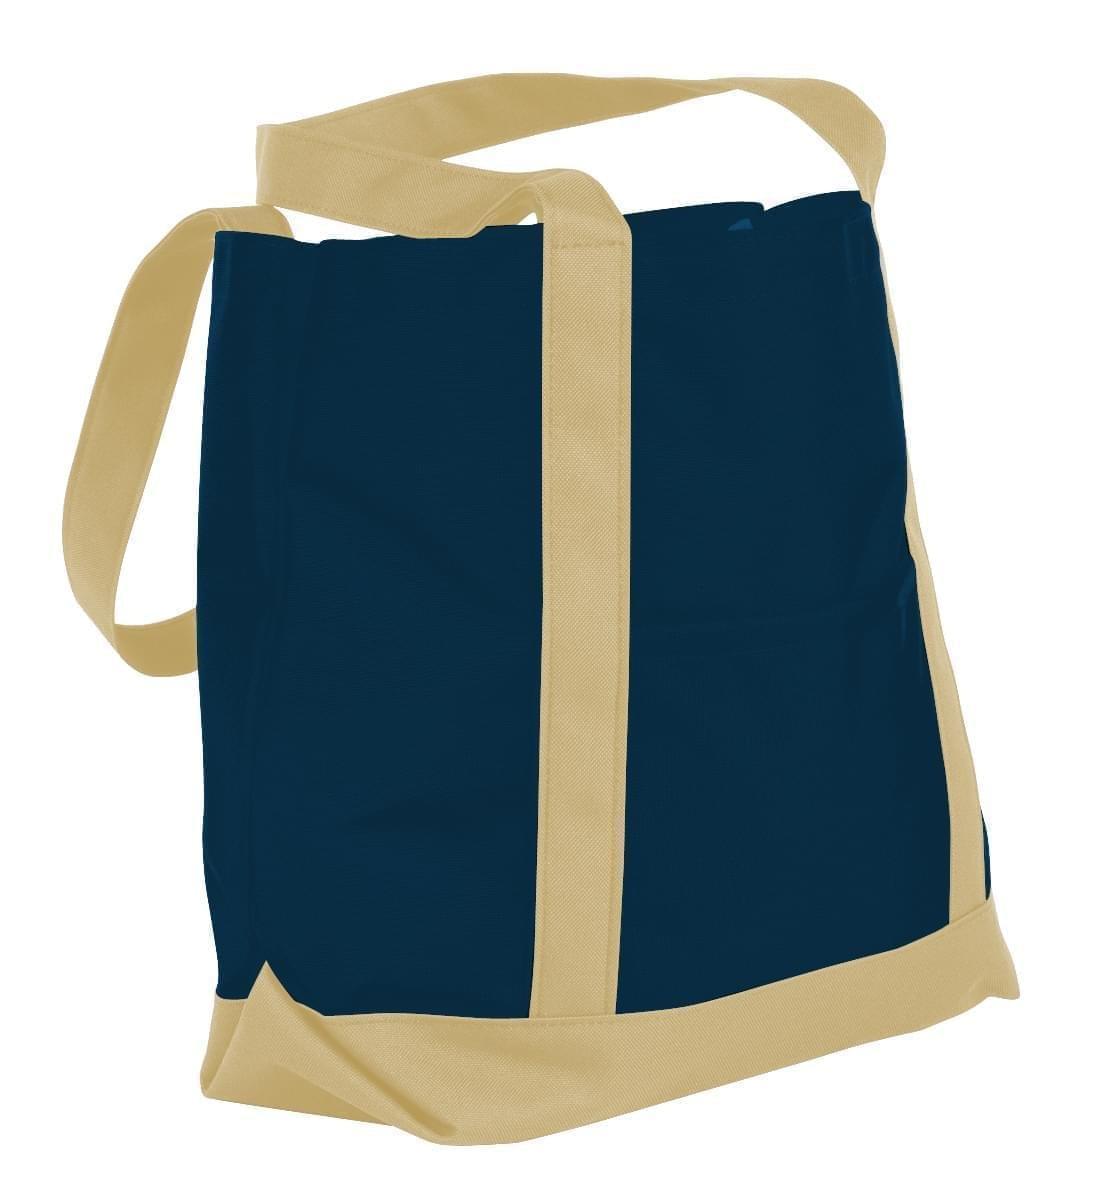 USA Made Nylon Poly Boat Tote Bags, Navy-Khaki, XAACL1UAWX